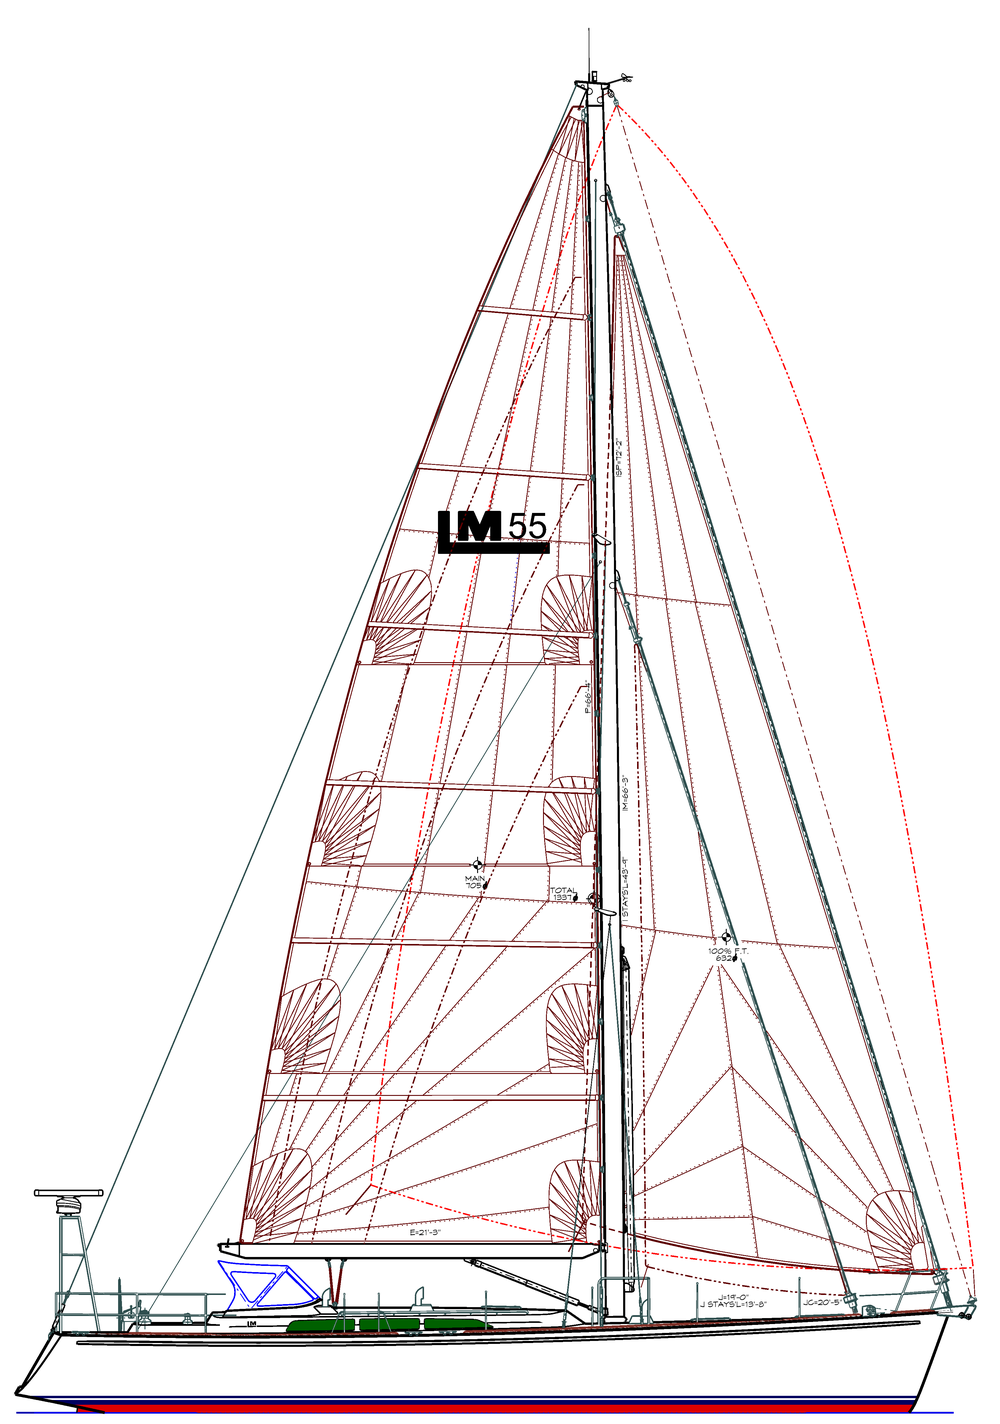 lm_55_sail_plan.png